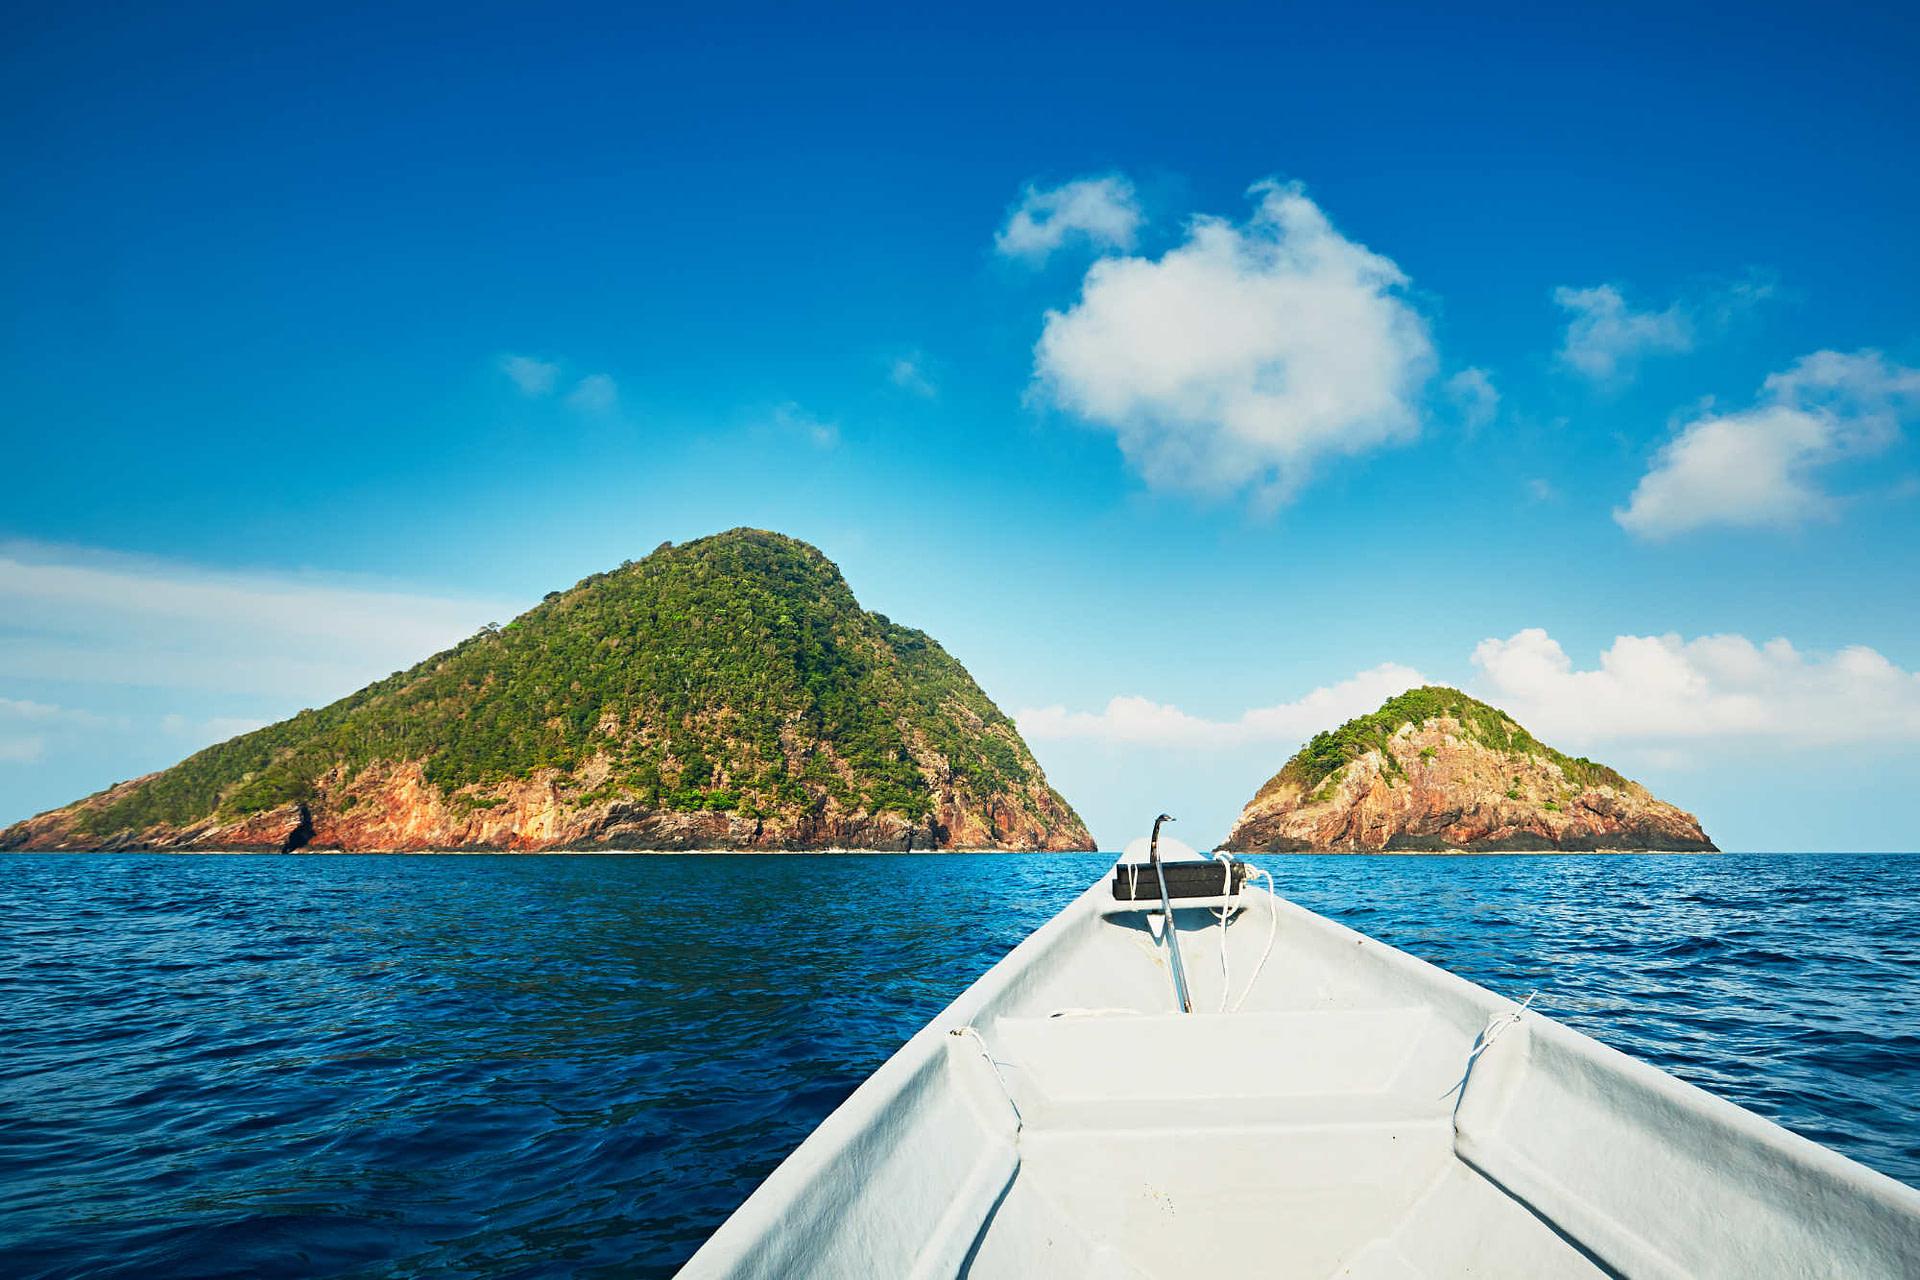 adventure-on-the-sea-P4QXWLU